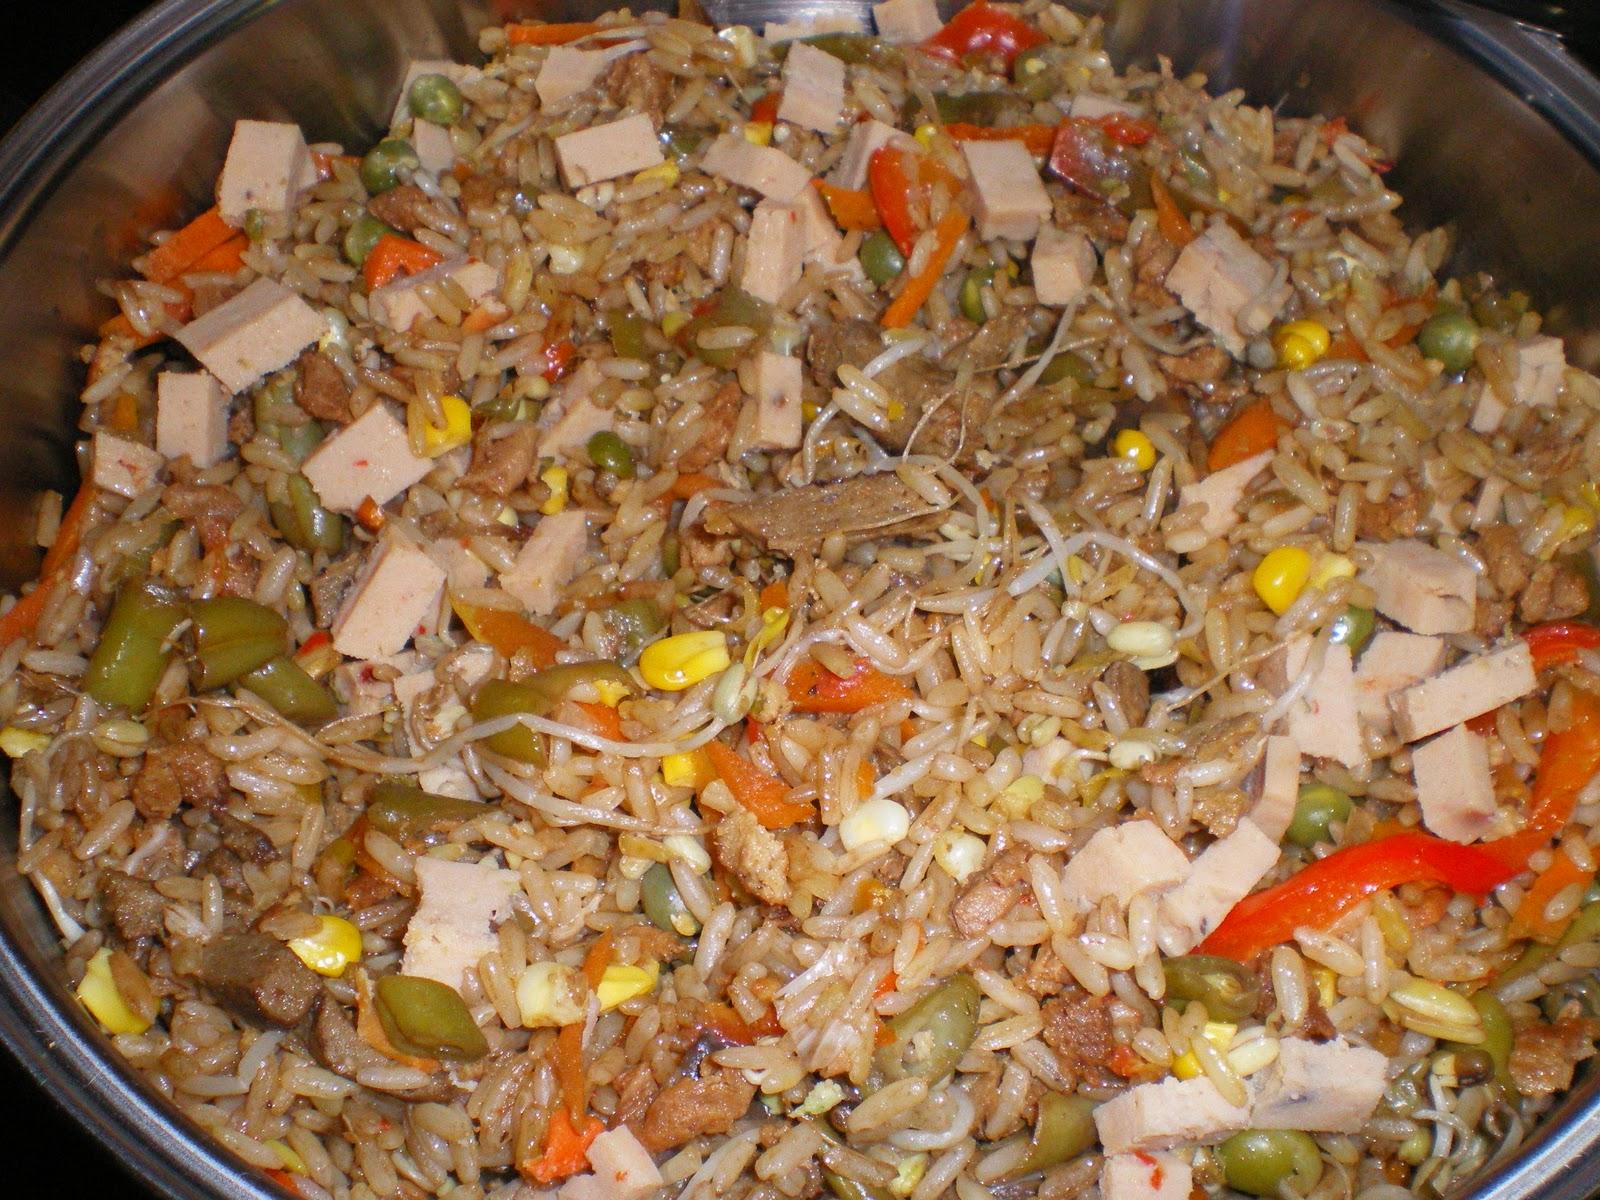 Recetas de arroz paisa